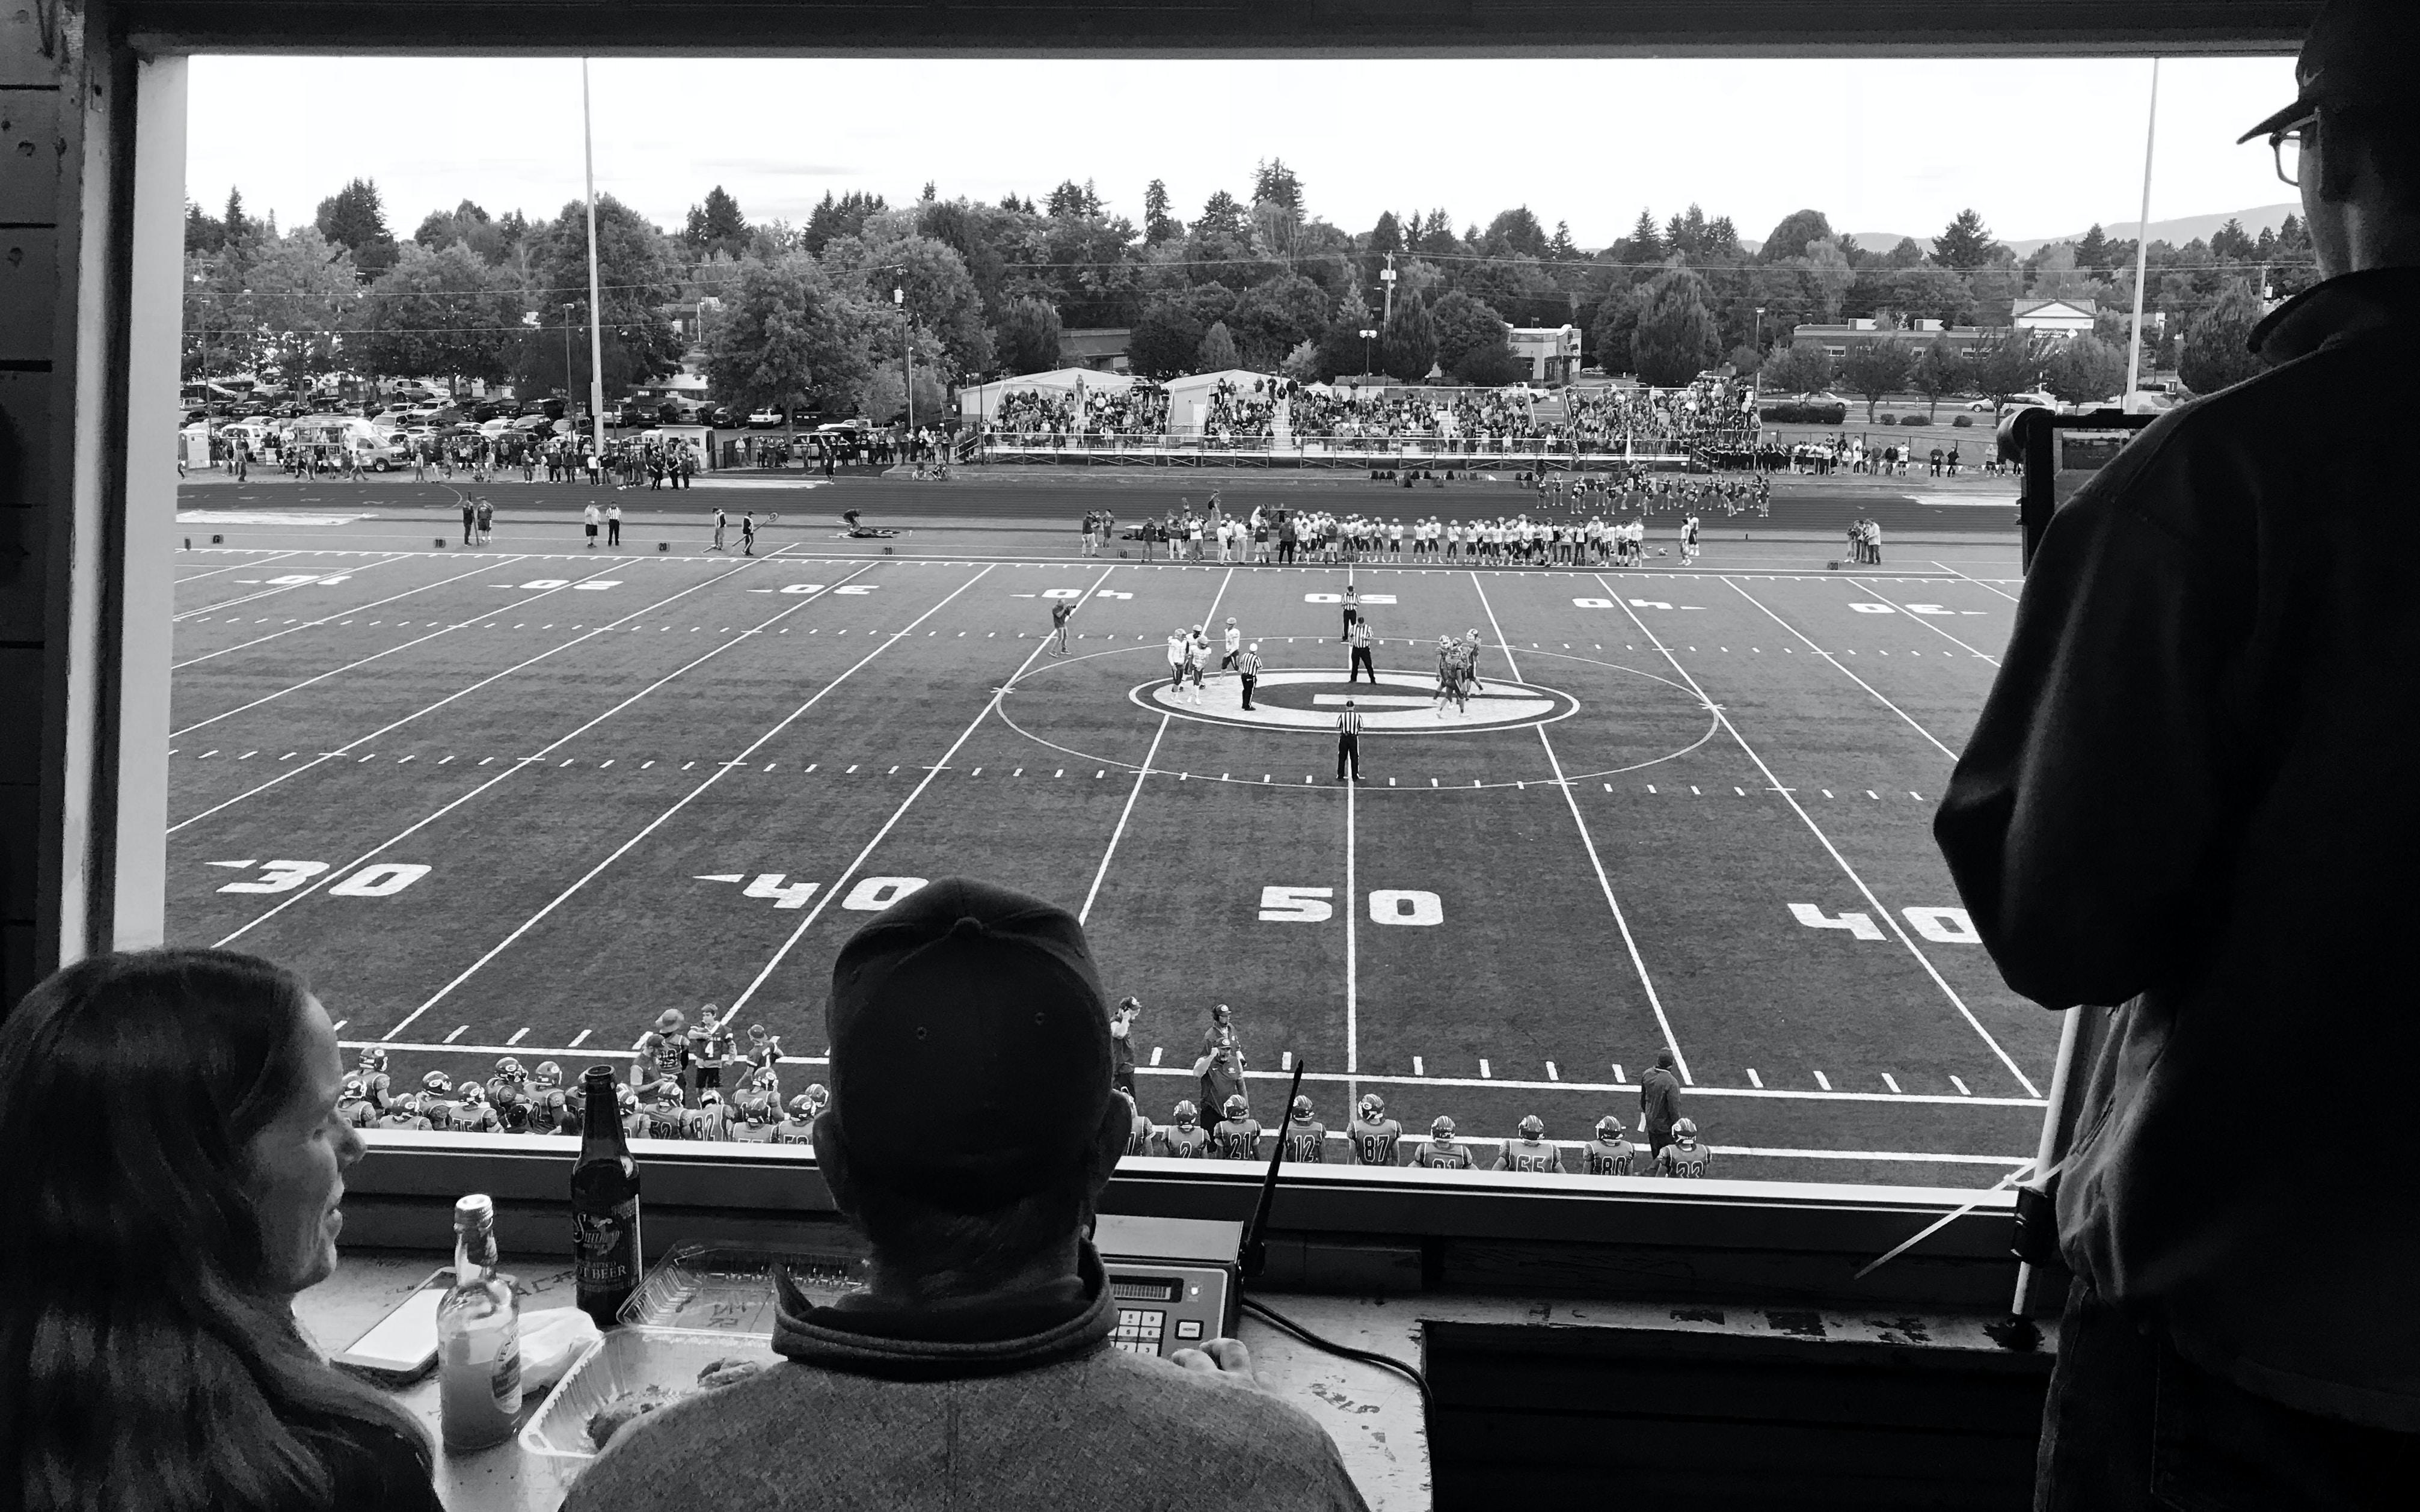 greyscale photo of football play